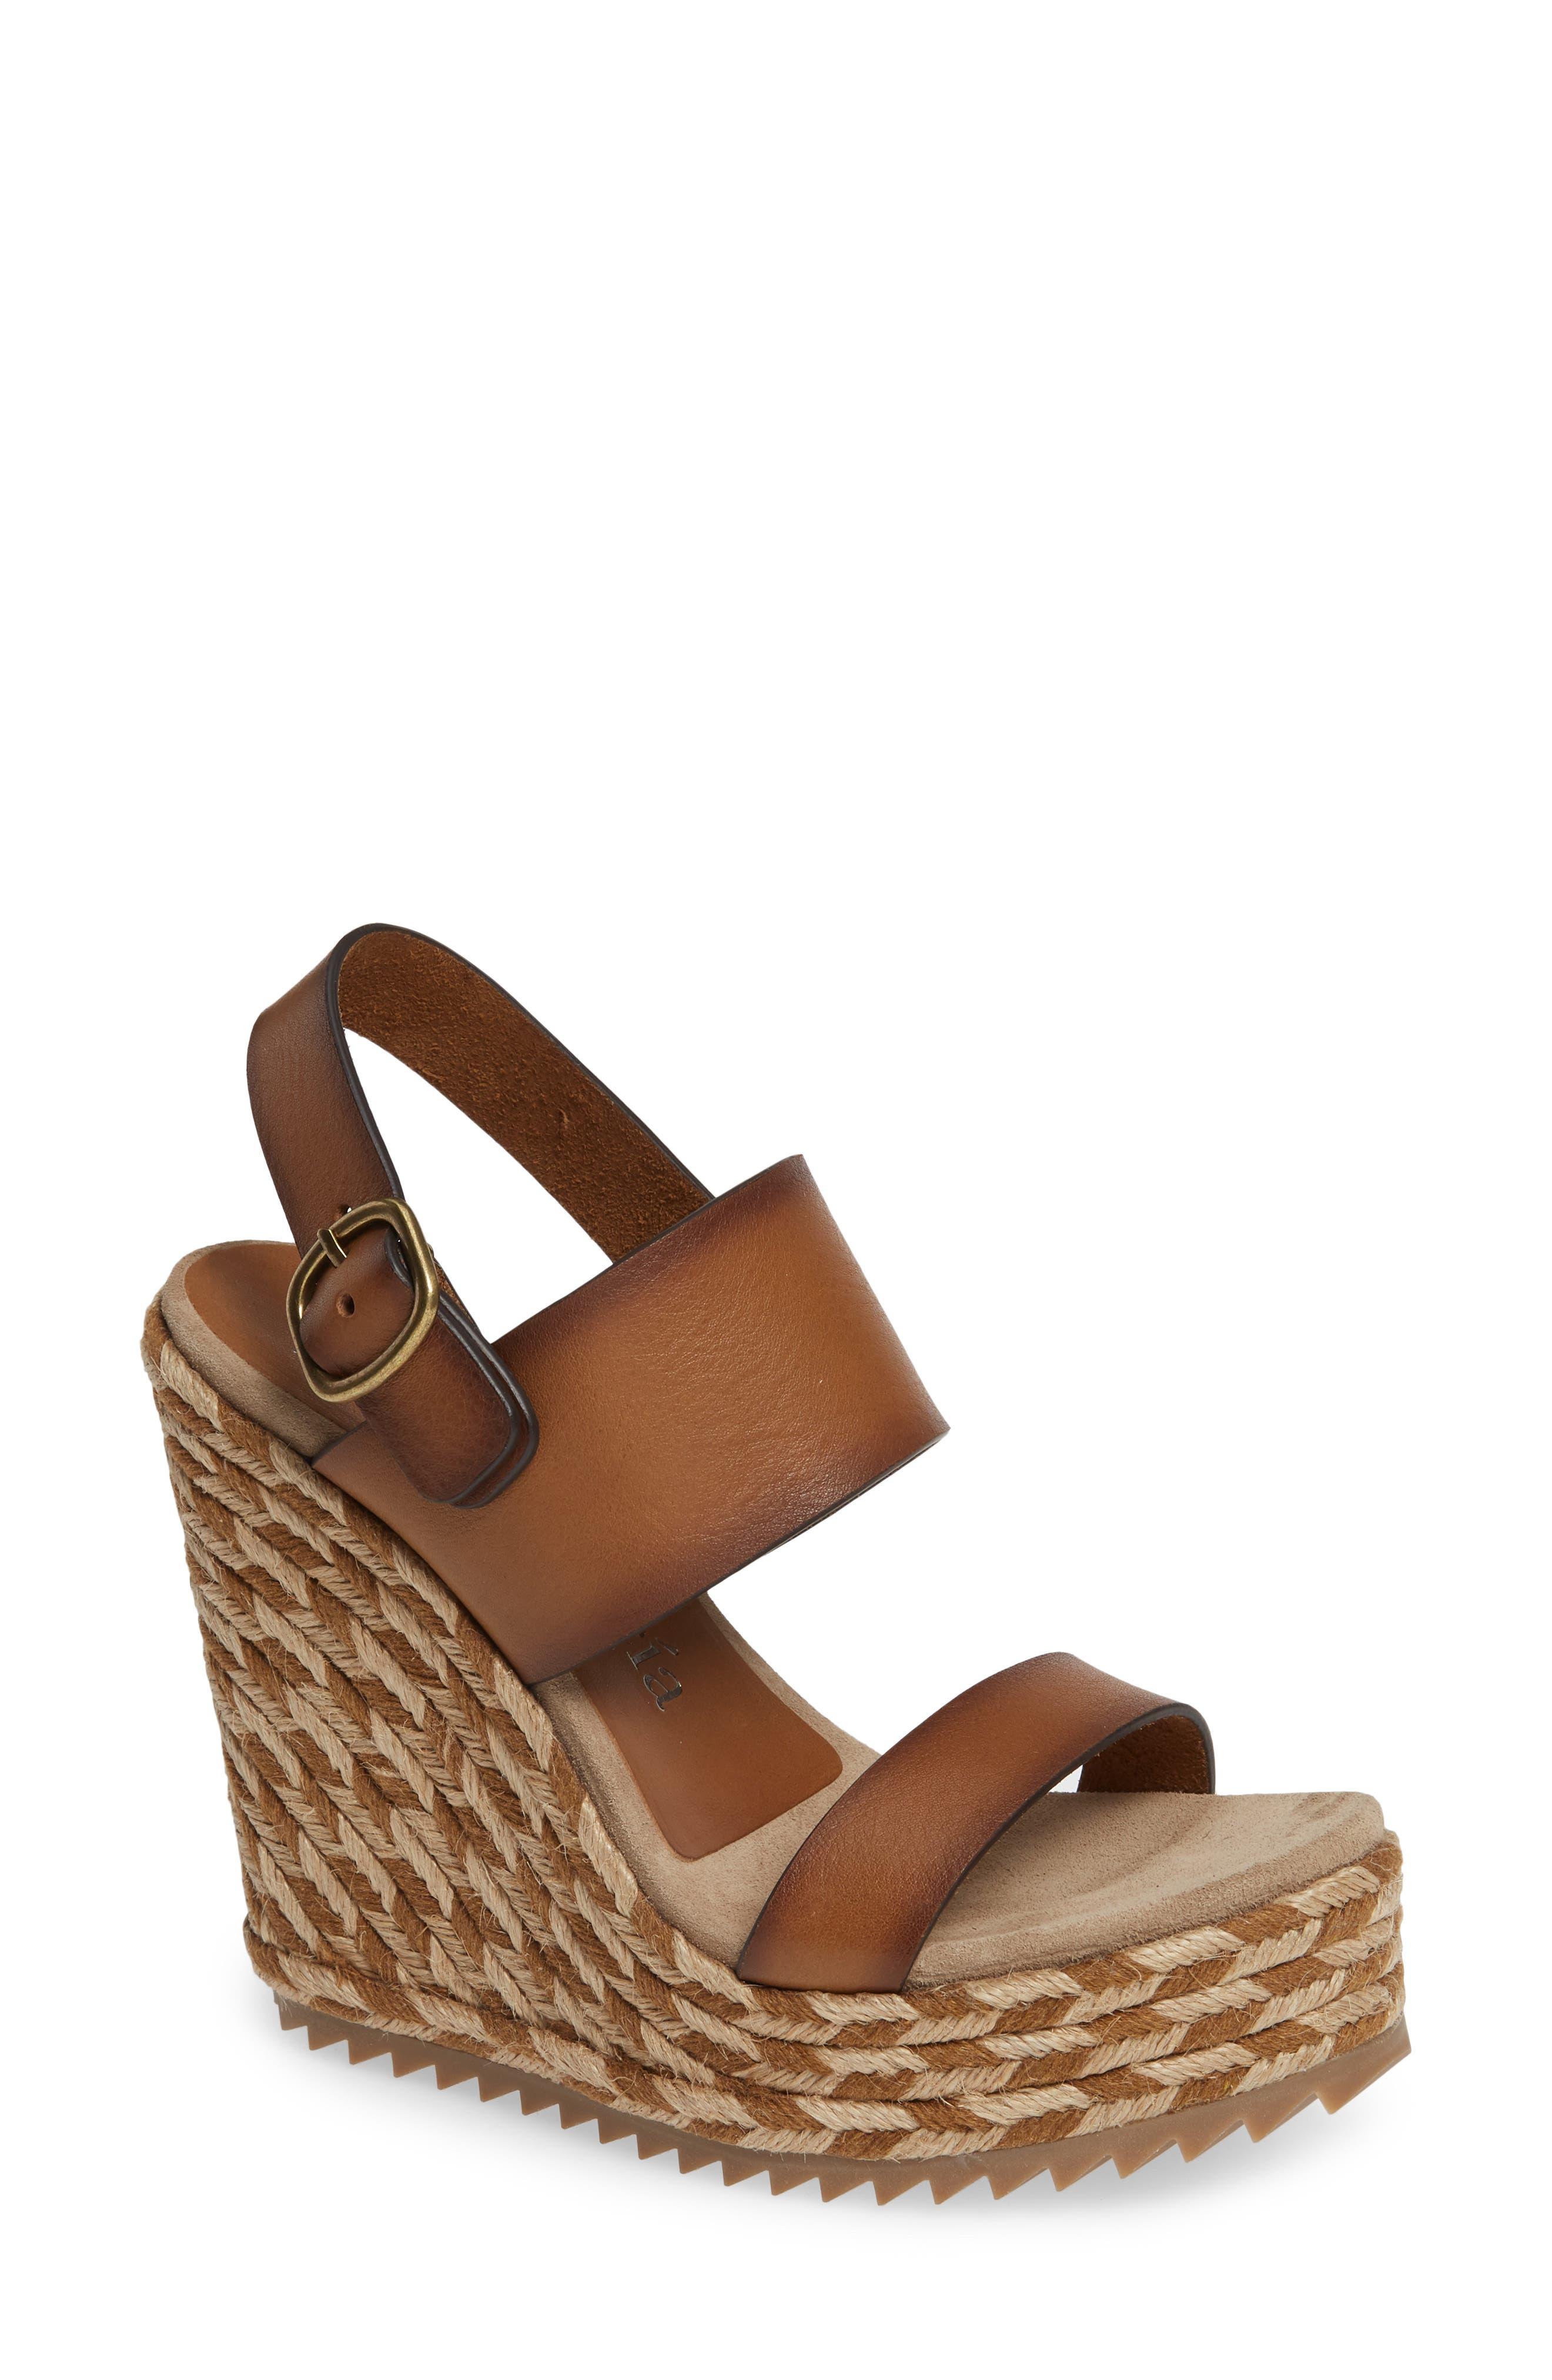 Pedro Garcia Tait Woven Wedge Sandal